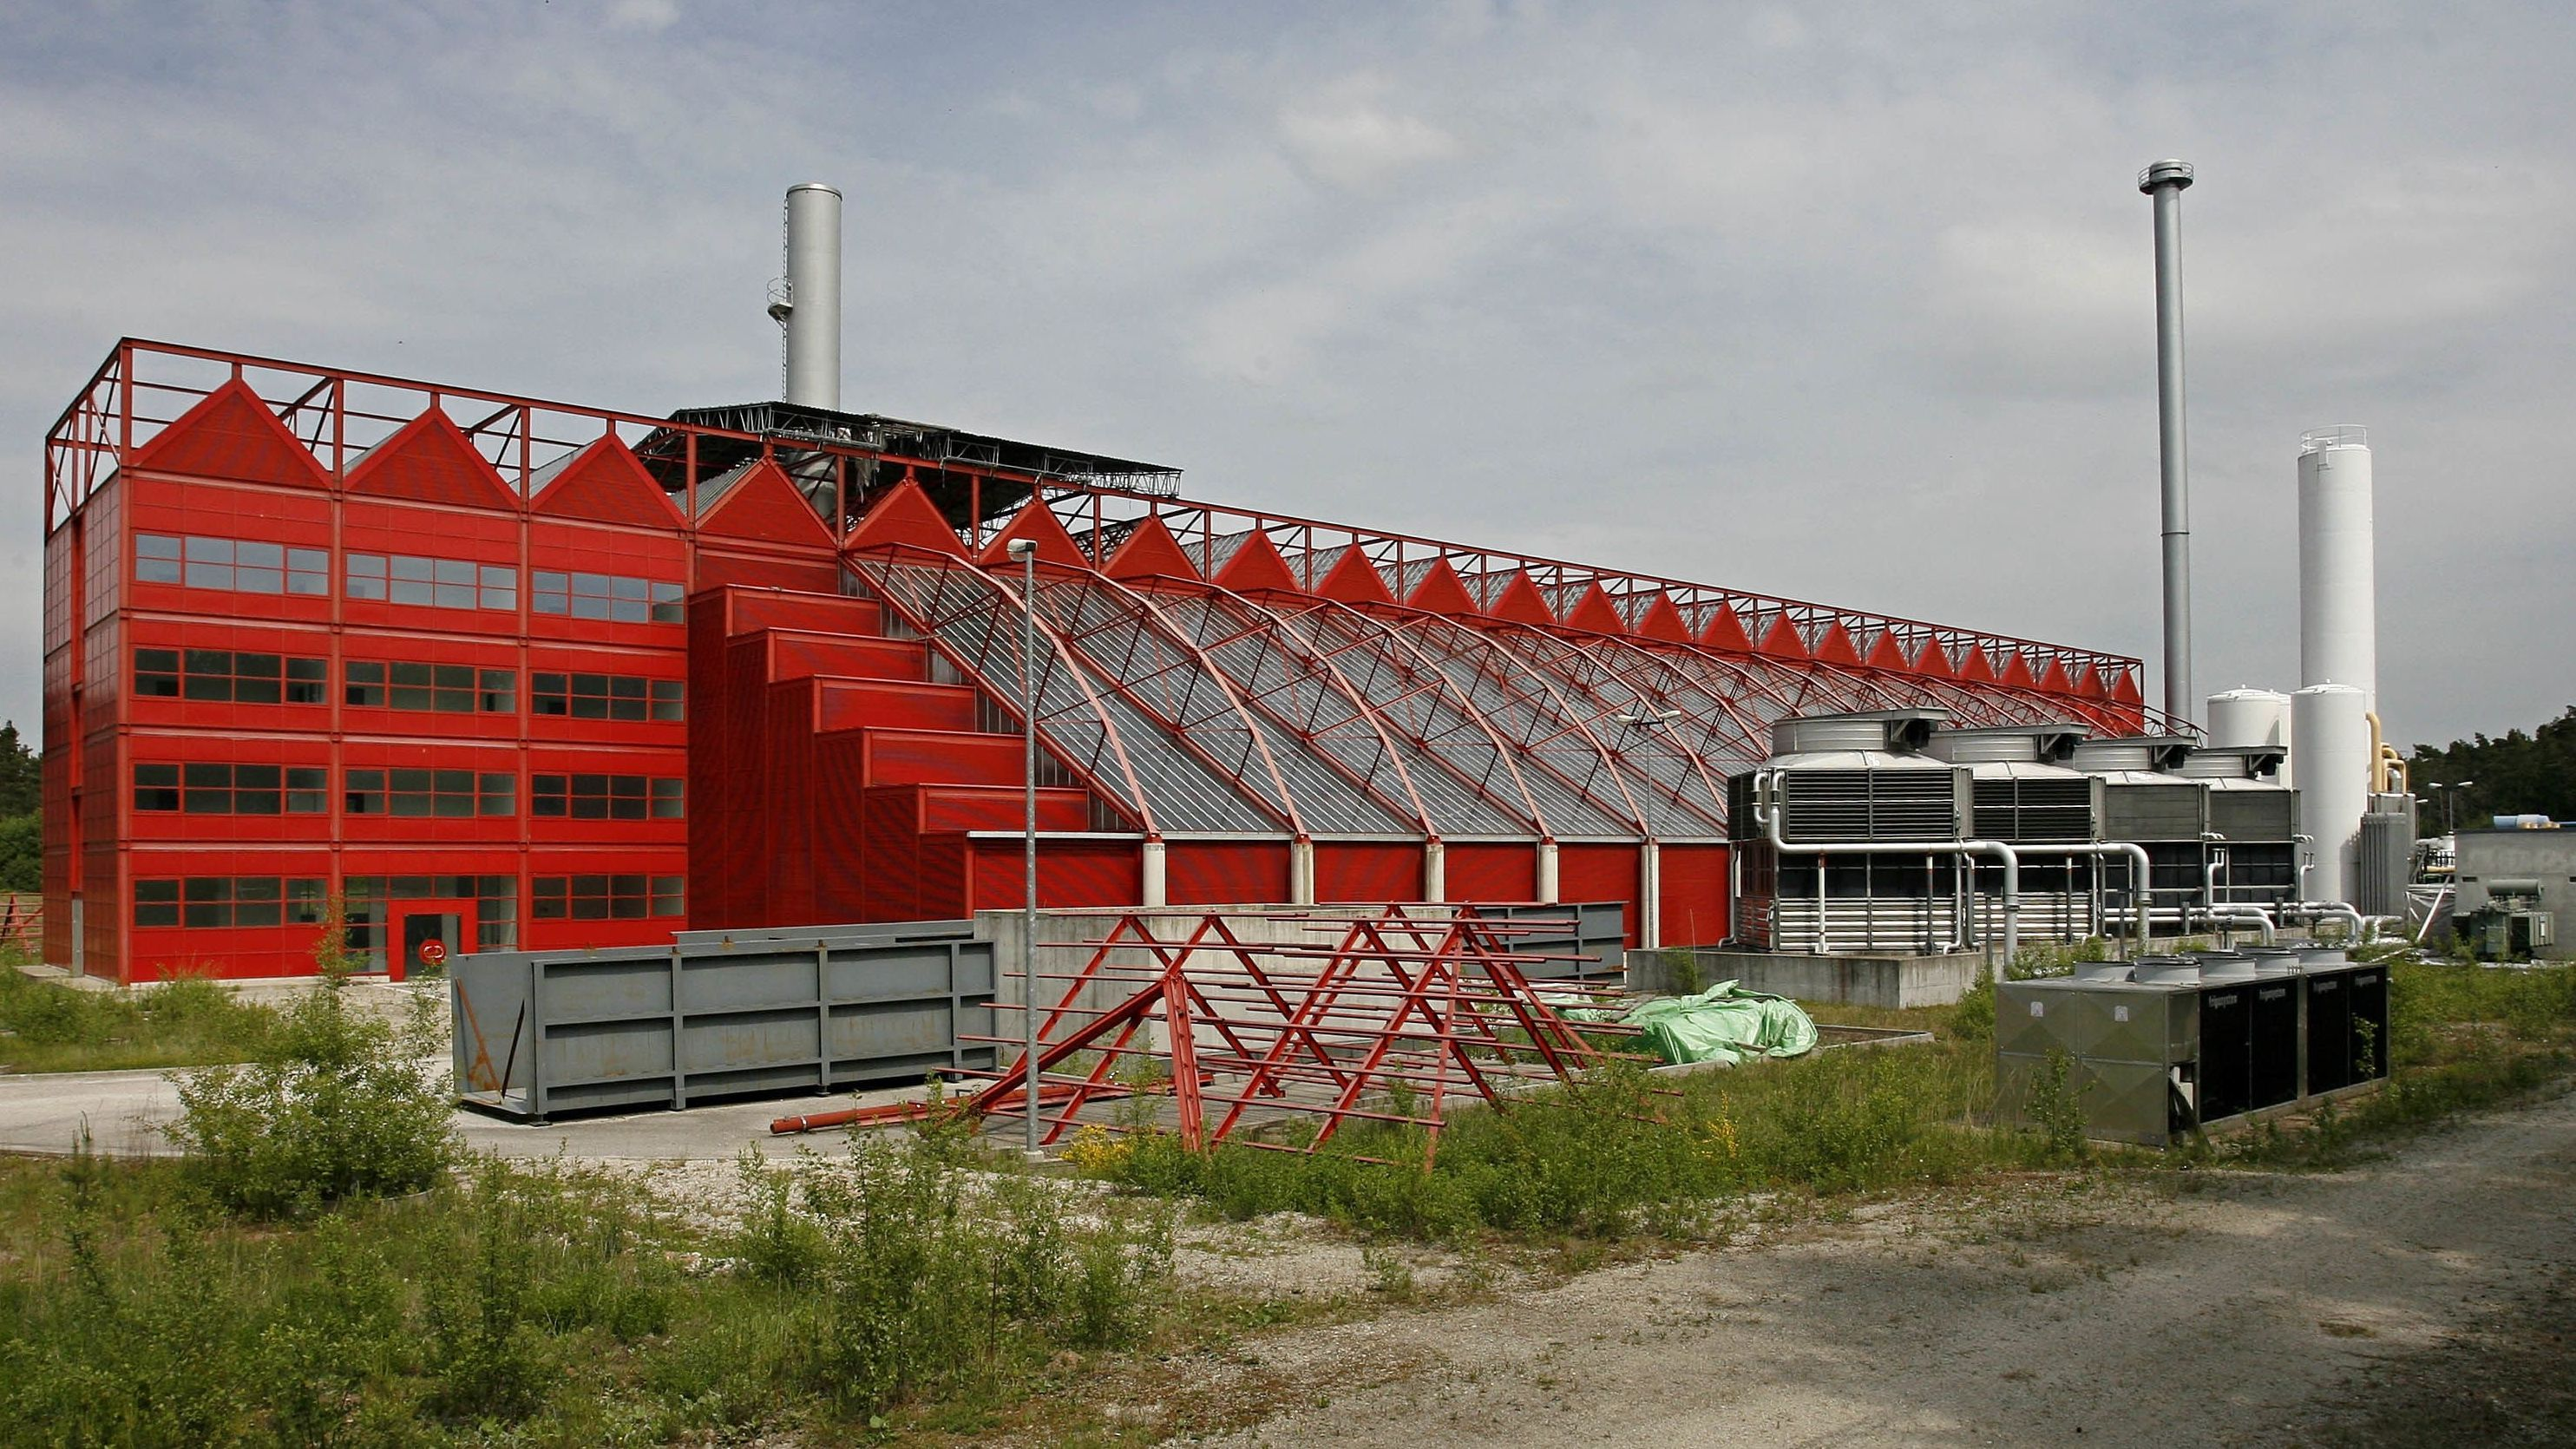 Blick auf die feuerrote leerstehende Thermoselect-Anlage in Ansbach-Brodswinden